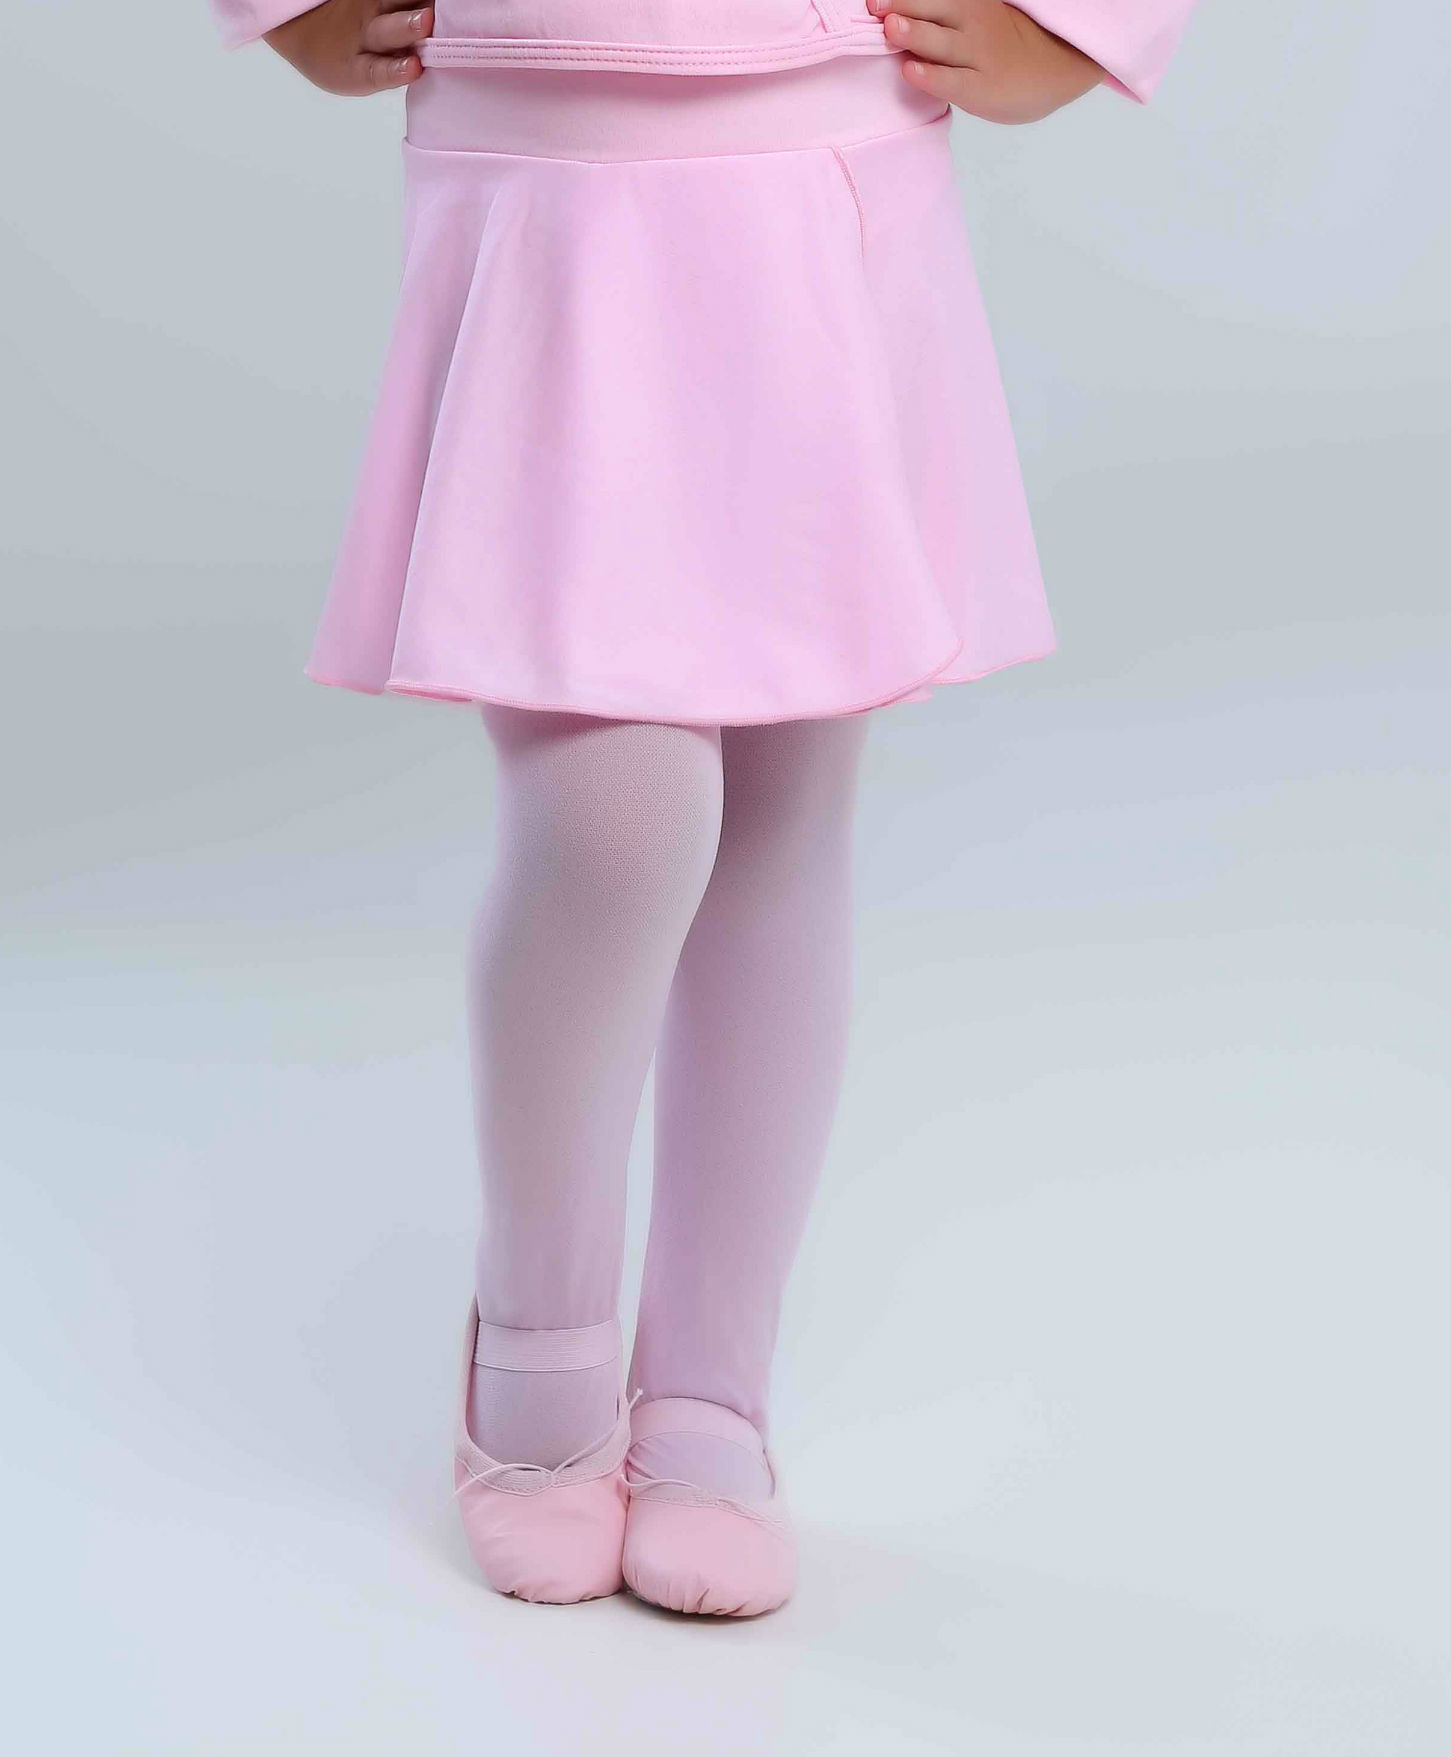 339396bfd Saia de Ballet Transpassar